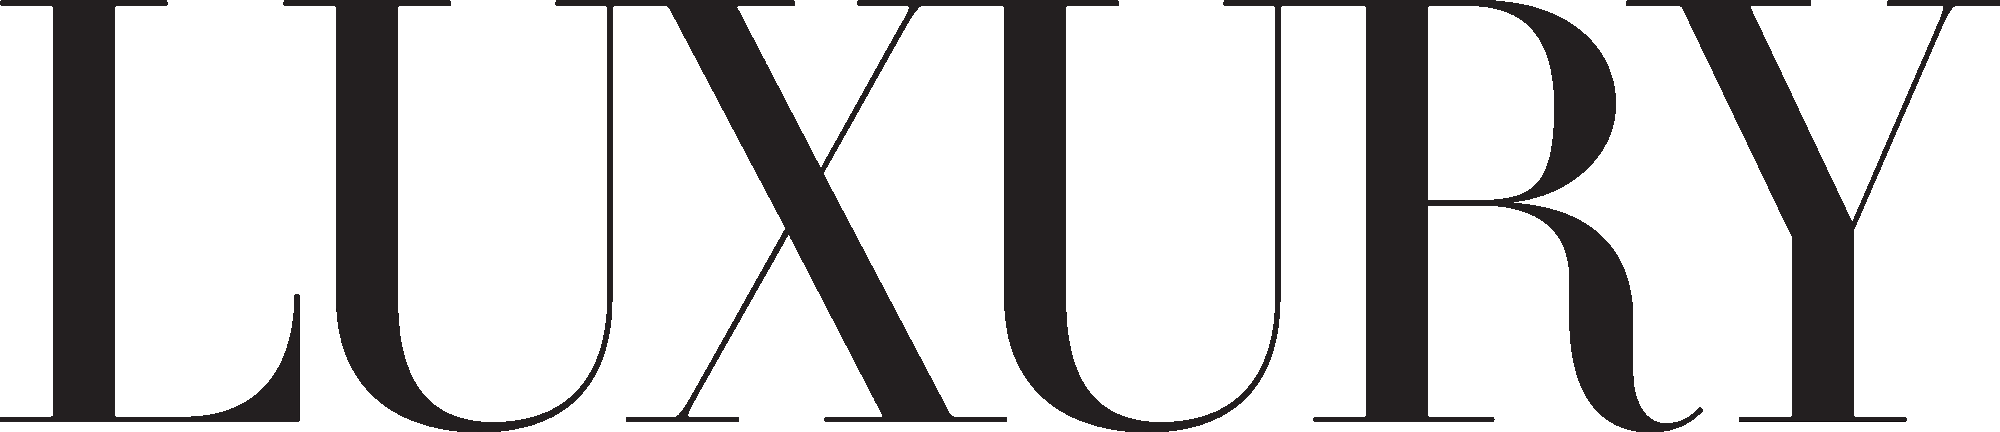 LUXURY logo black